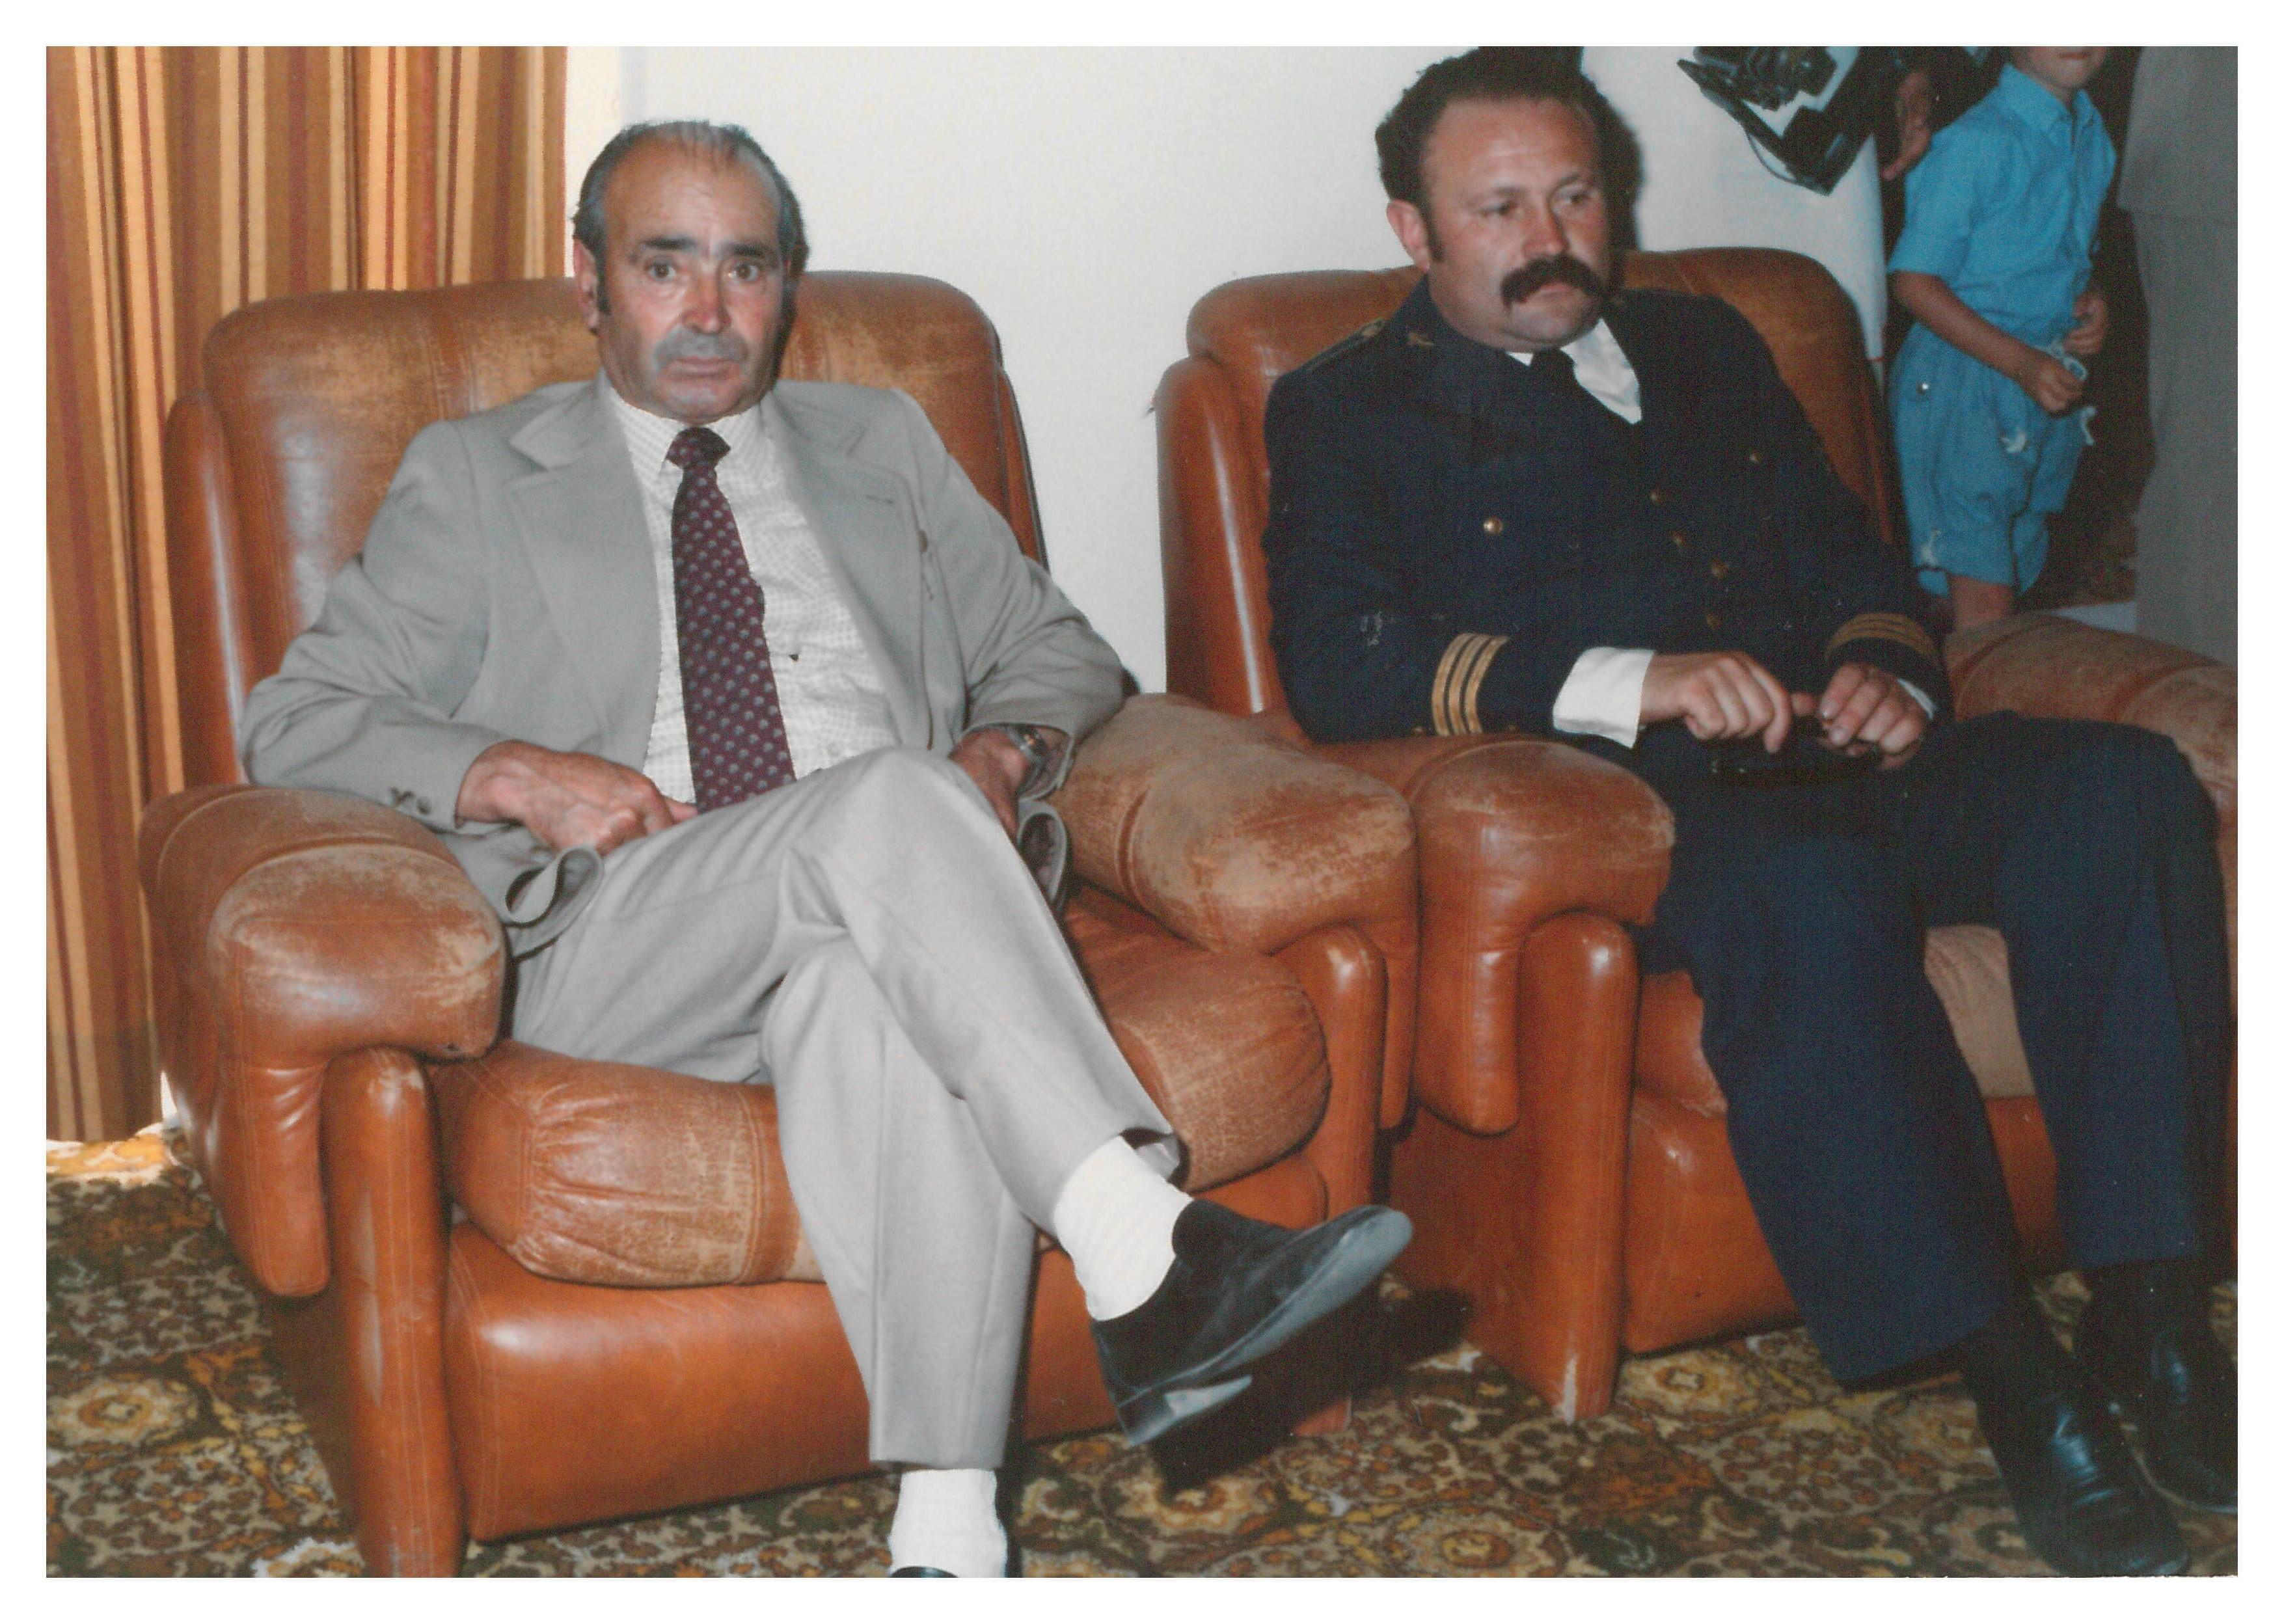 Visita Presidente República Ramalho Eanes 1984 (40), People, Portrait, HQ Photo